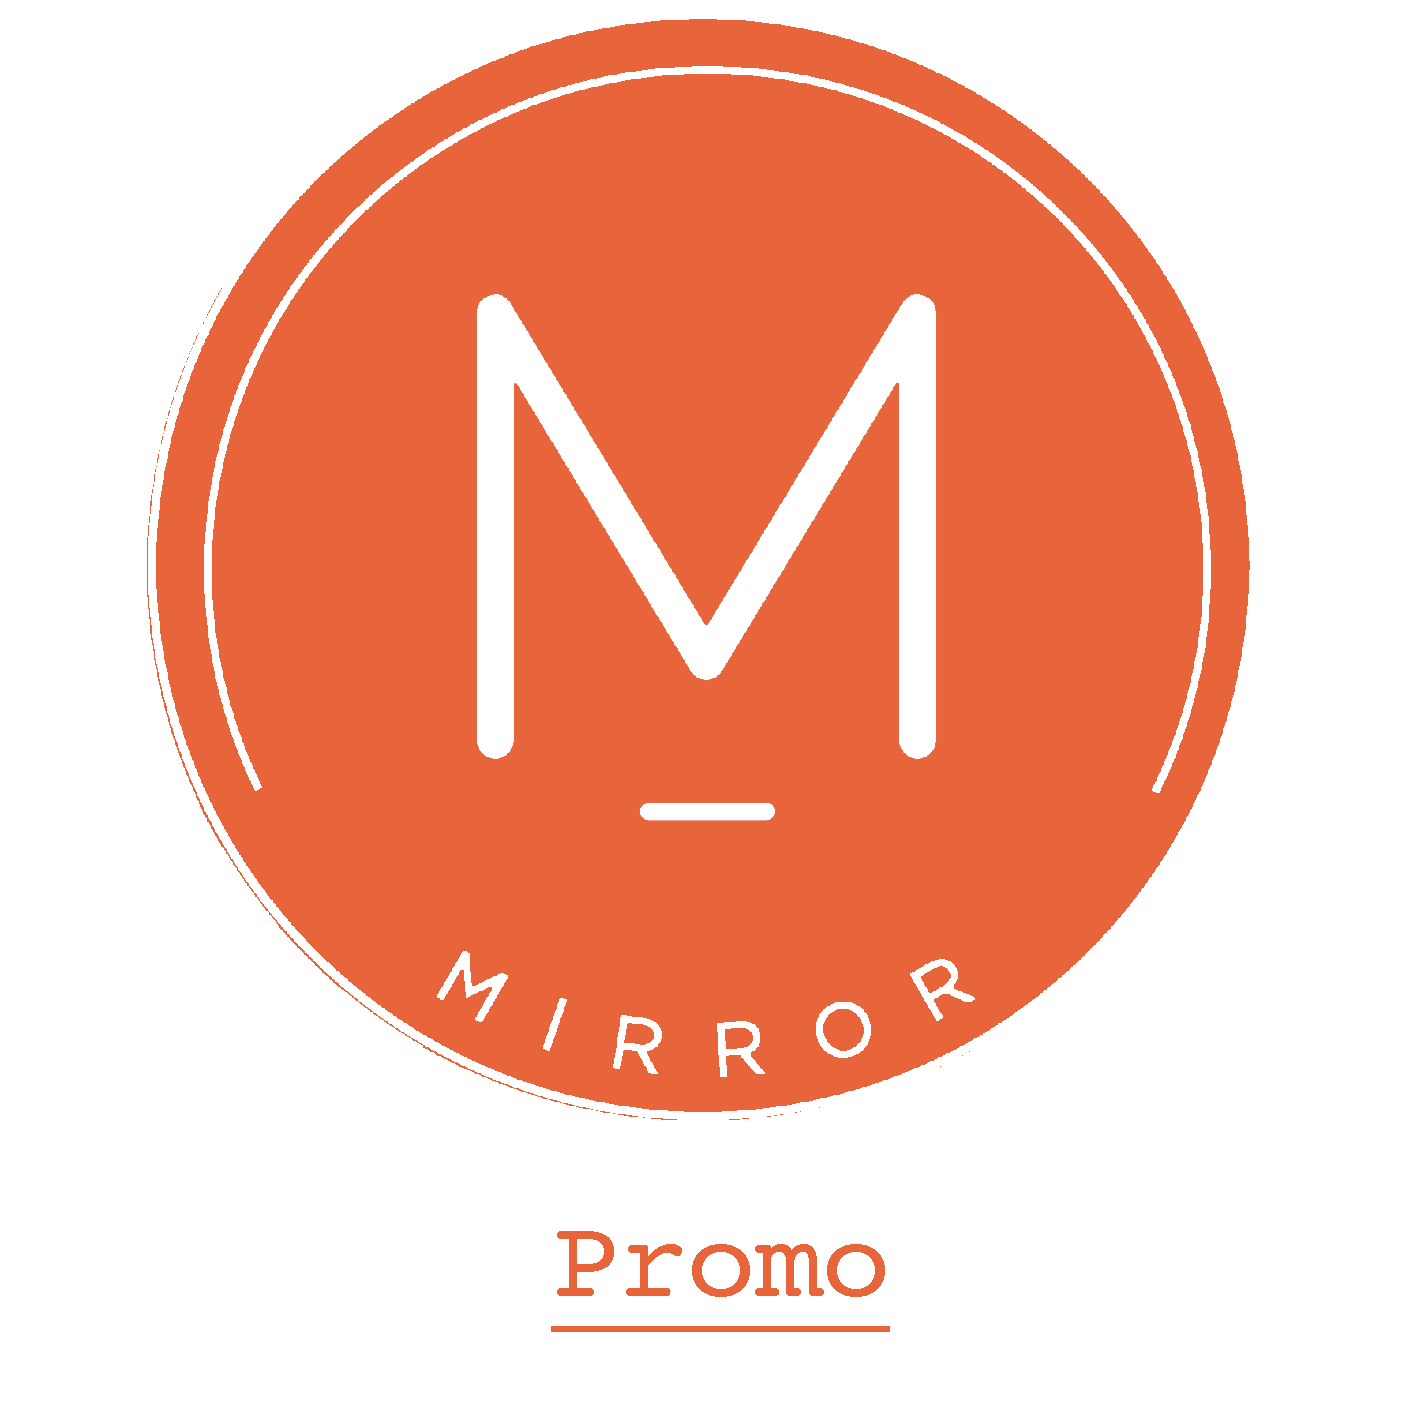 logo mirror promo